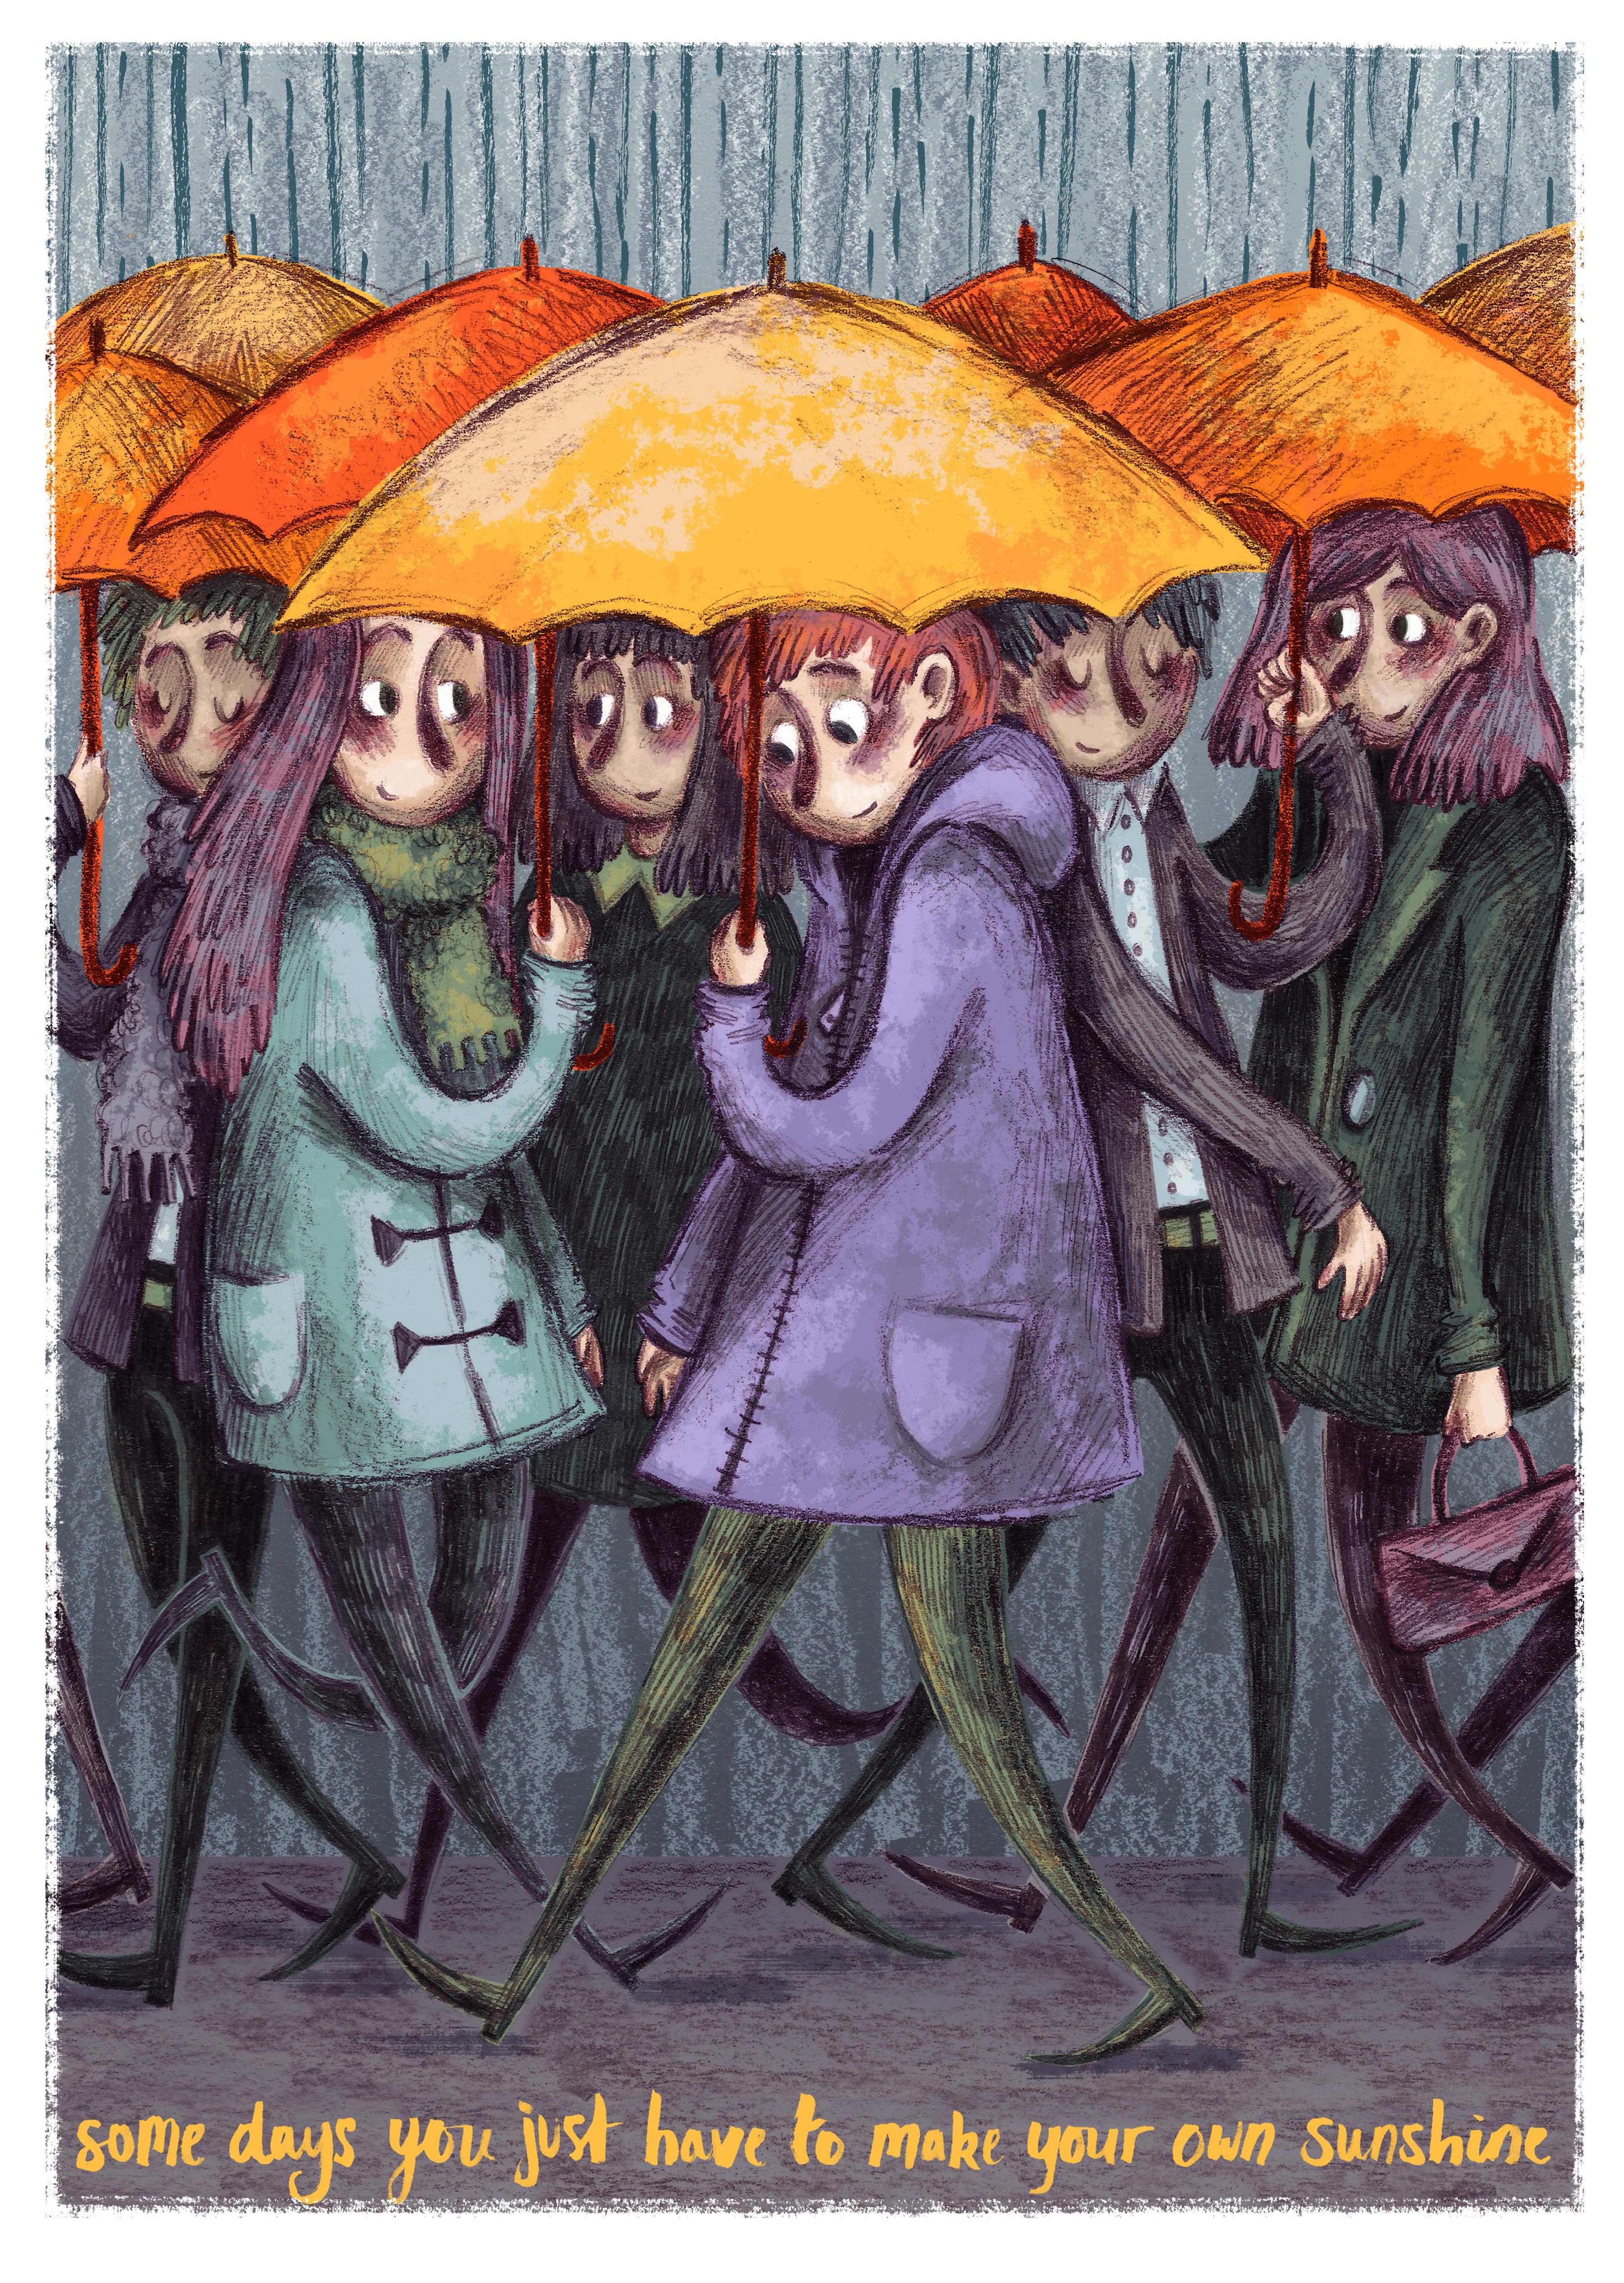 Rain_HighRes_Bleed_Crowd_MaiaFjord_RGB